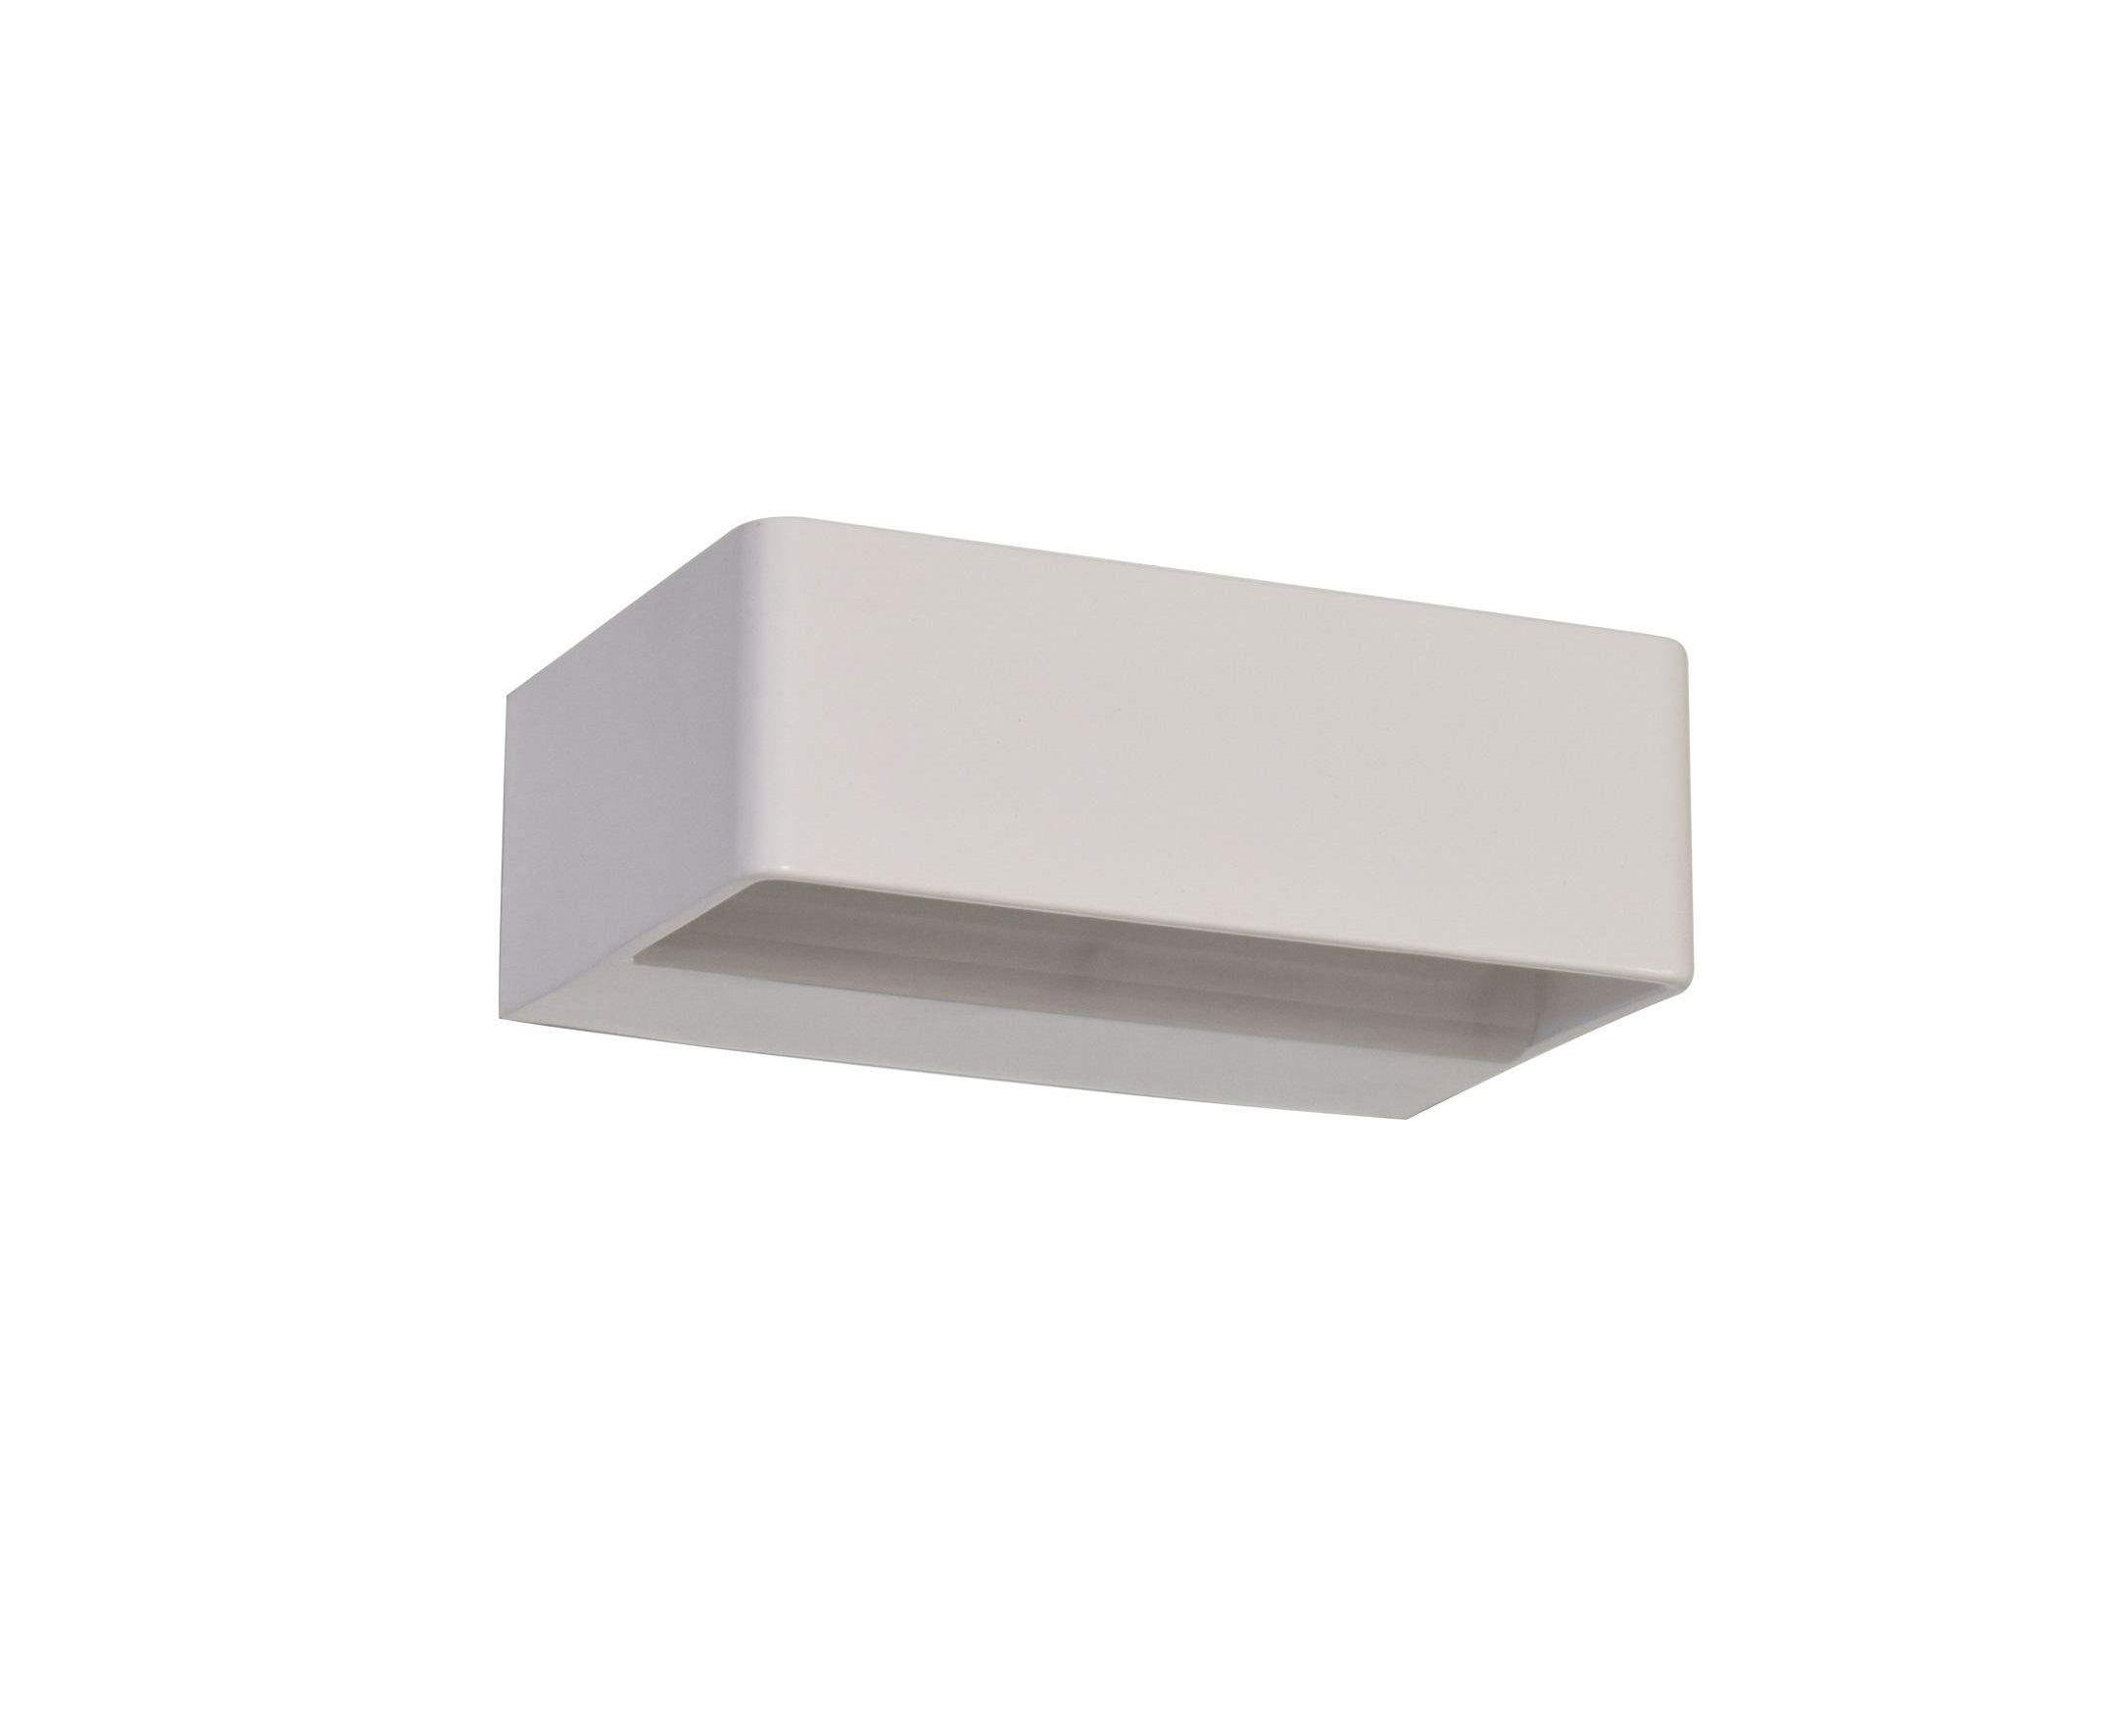 چراغ دیواری - WL-R-9701